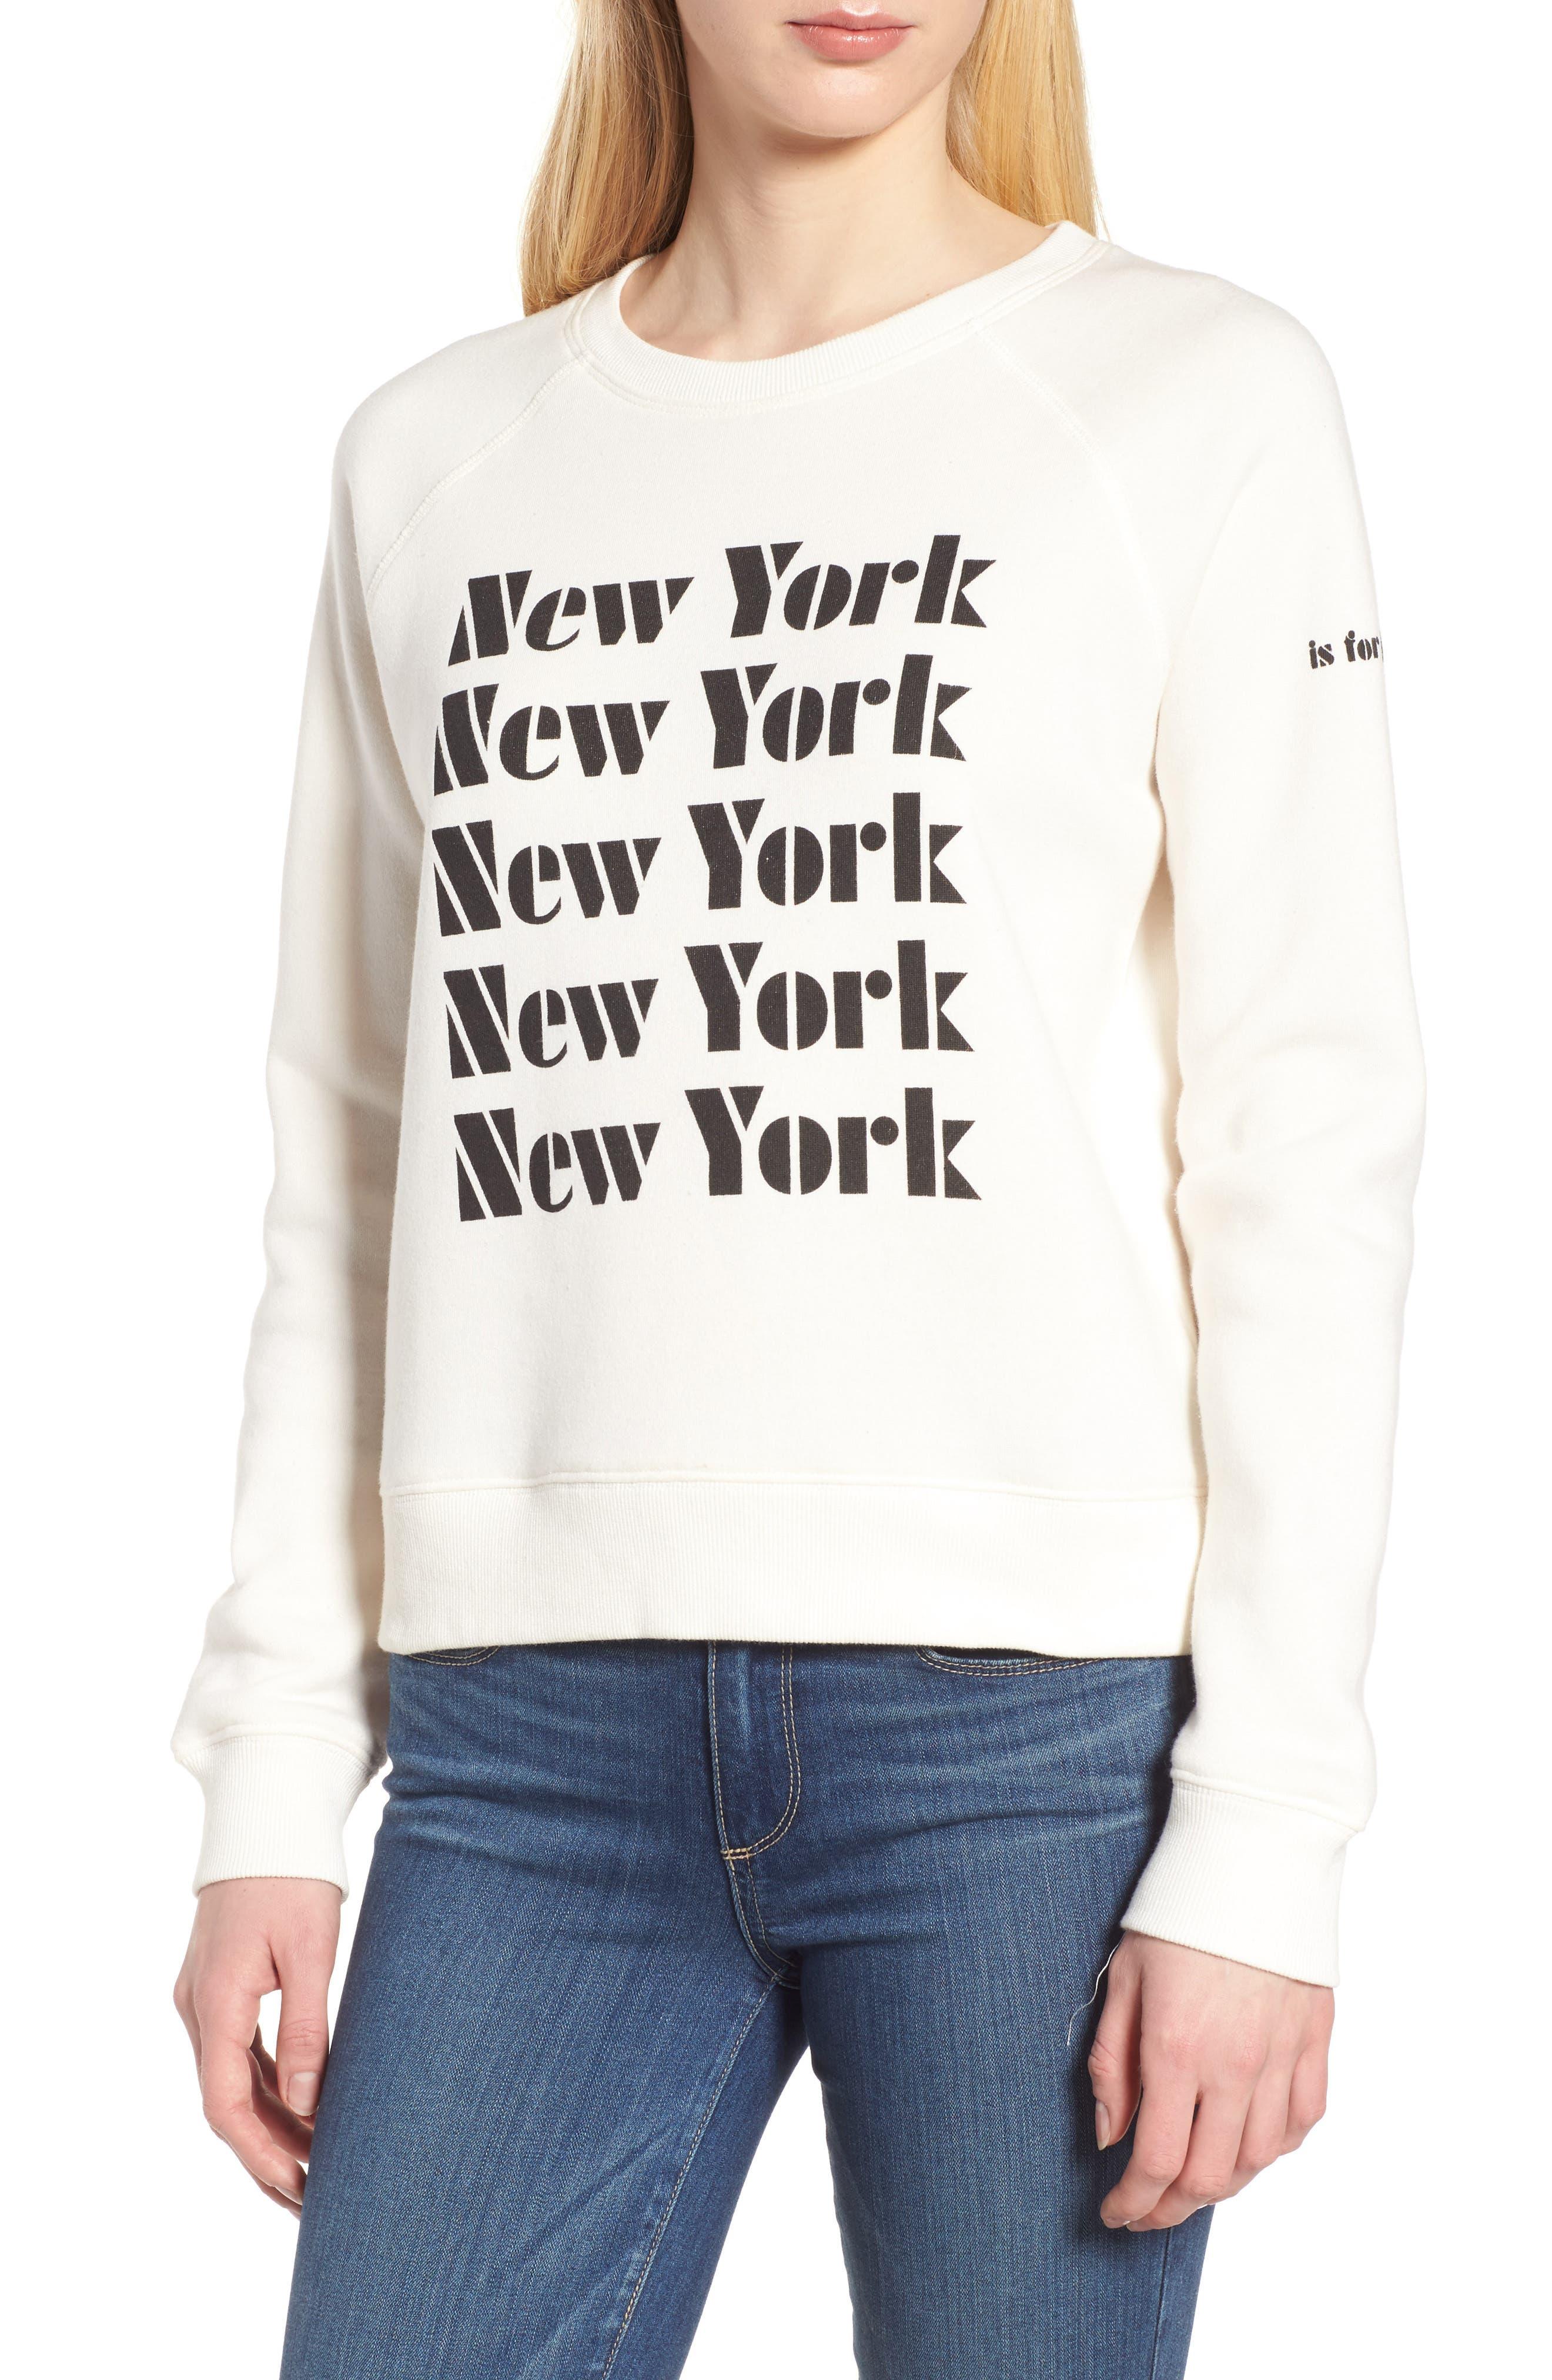 New York Sweatshirt,                             Main thumbnail 1, color,                             901